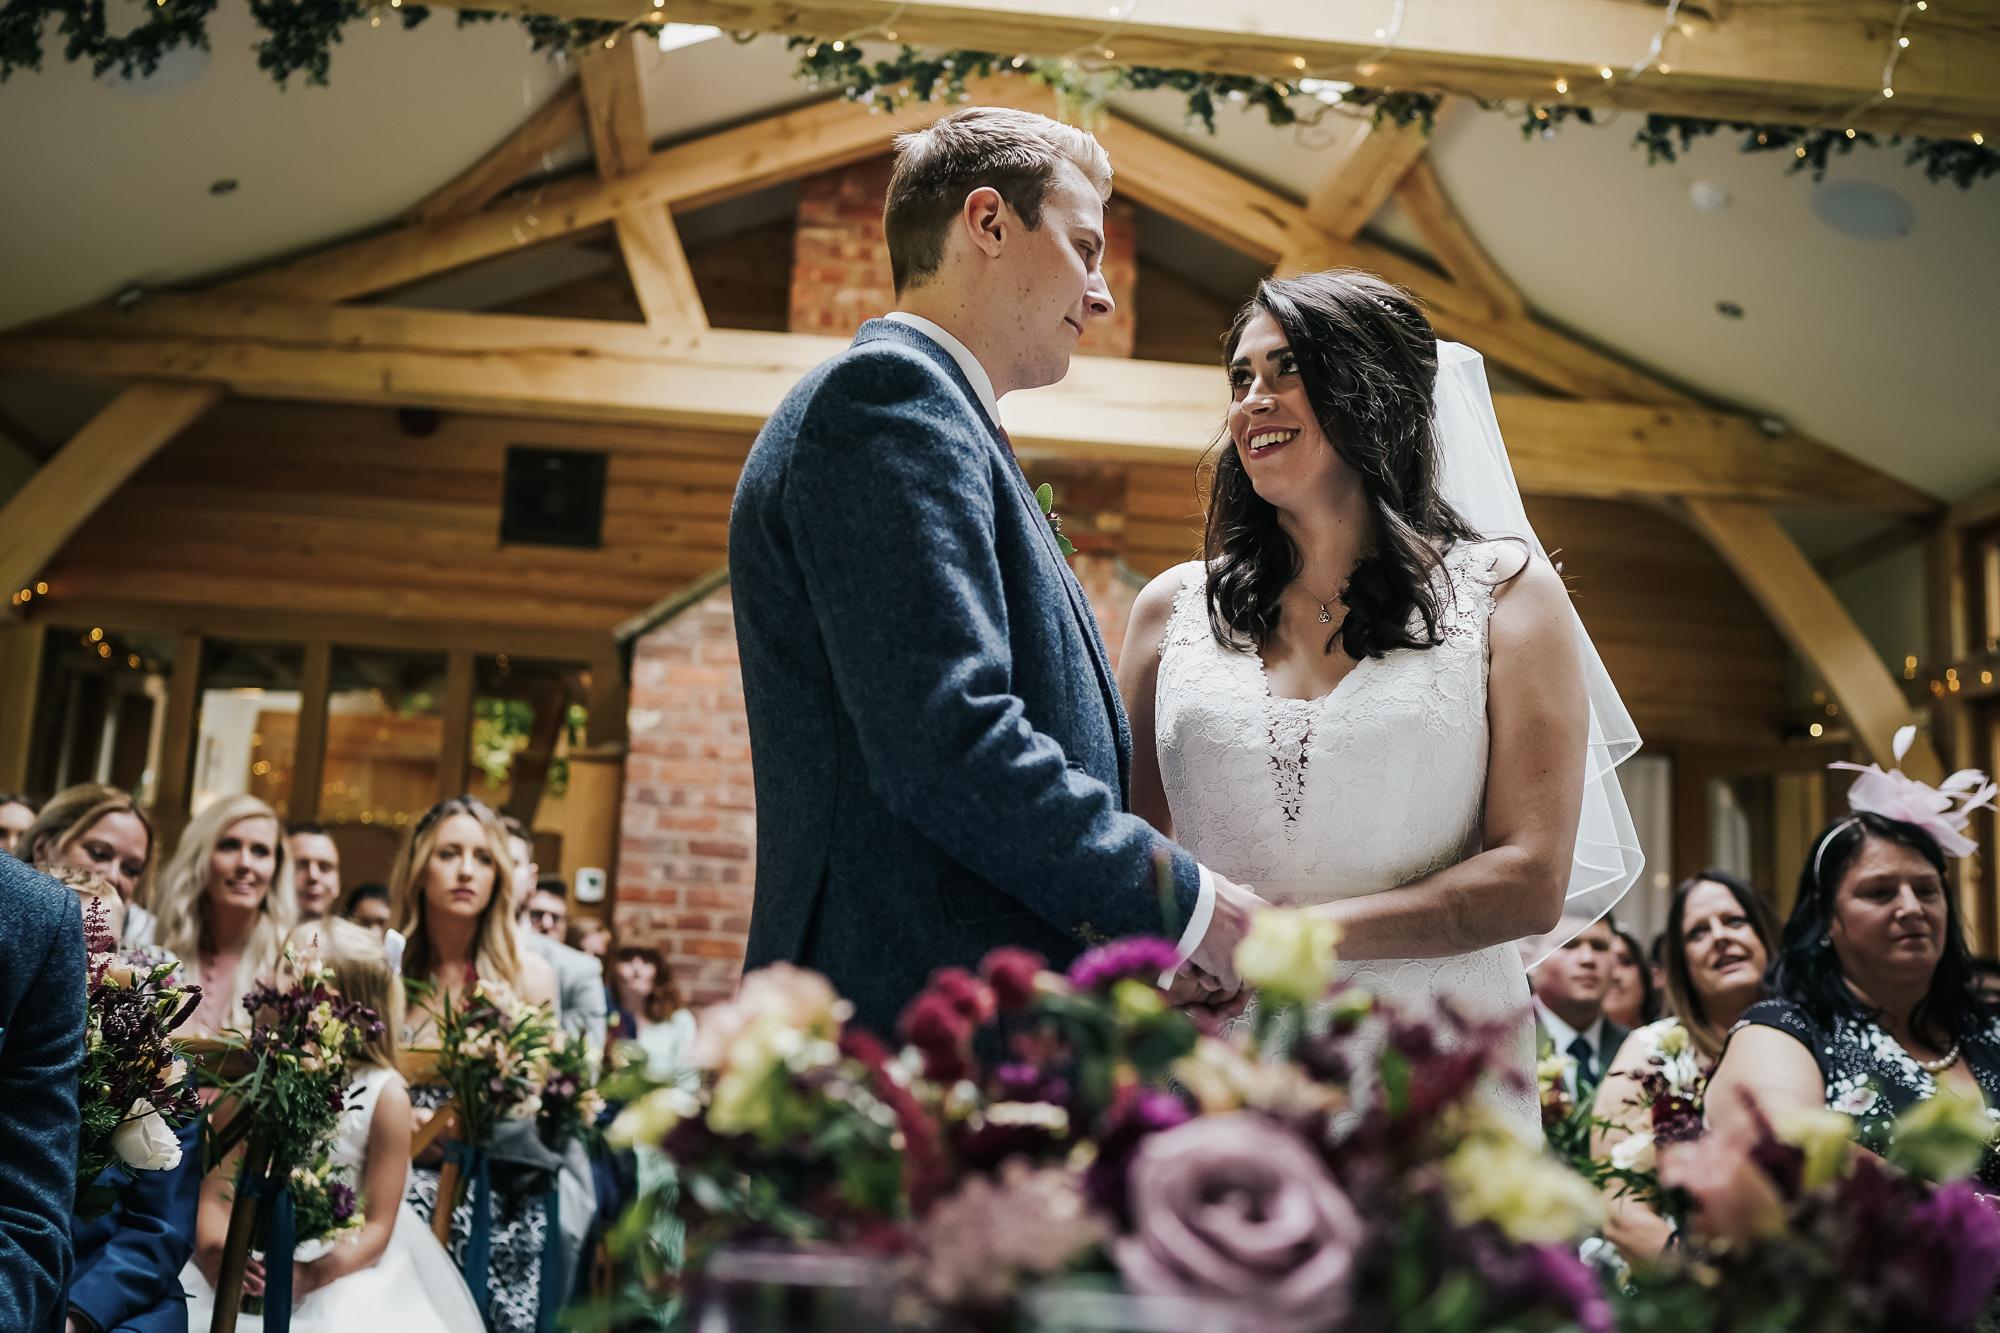 Oak tree of peover wedding photography cheshire wedding photographer (16 of 56).jpg